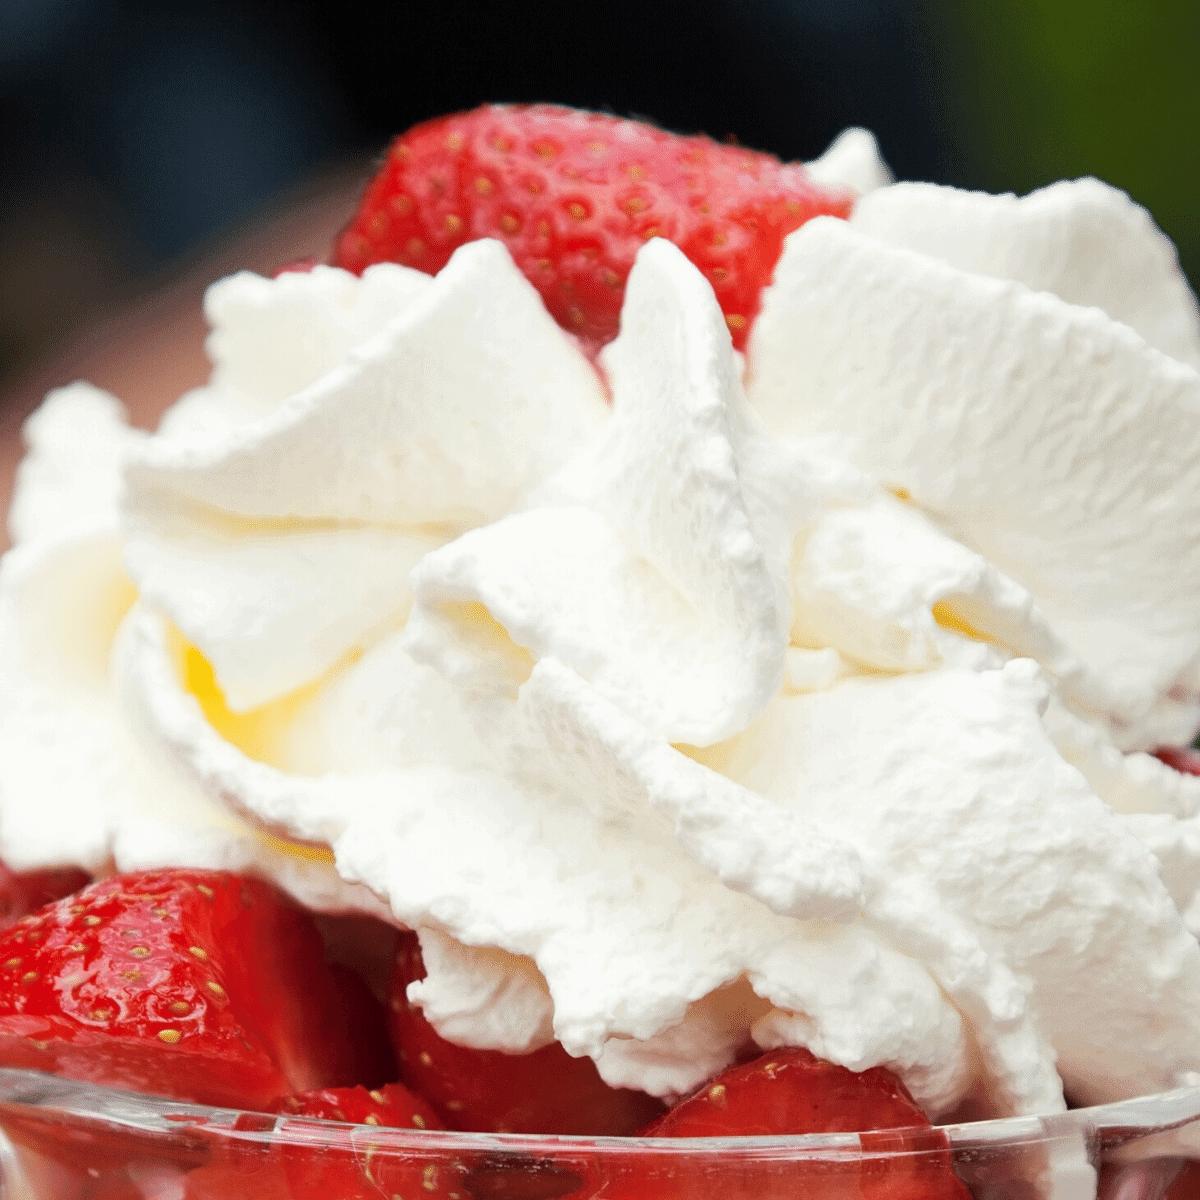 Homemade Keto Whipped Cream recipe low carb gluten free